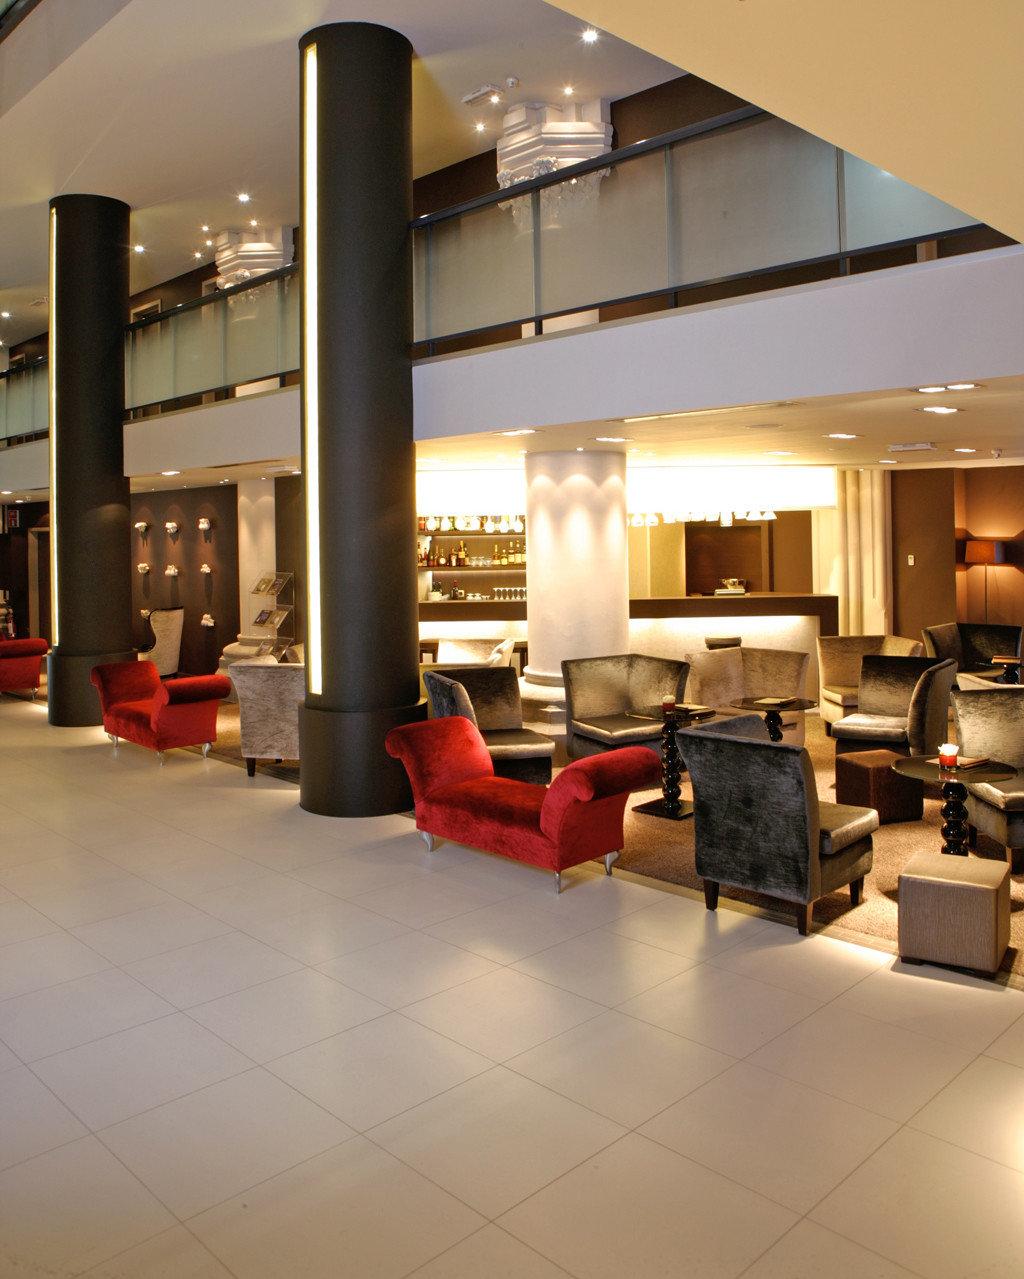 Bar City Cultural Drink Historic Lounge Lobby Architecture living room lighting condominium flooring